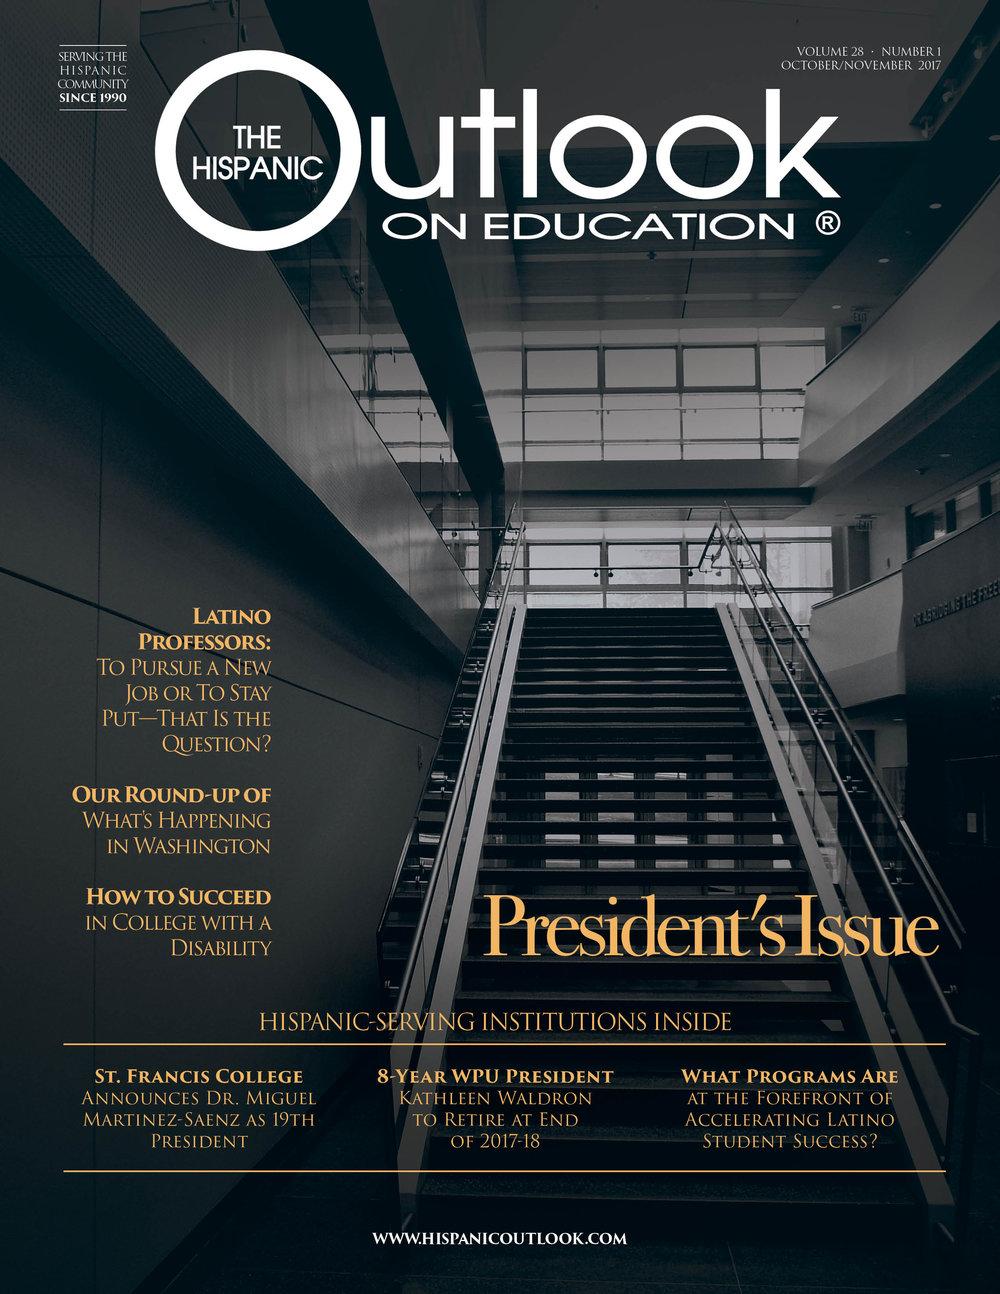 PRESIDENT'S ISSUE 2017